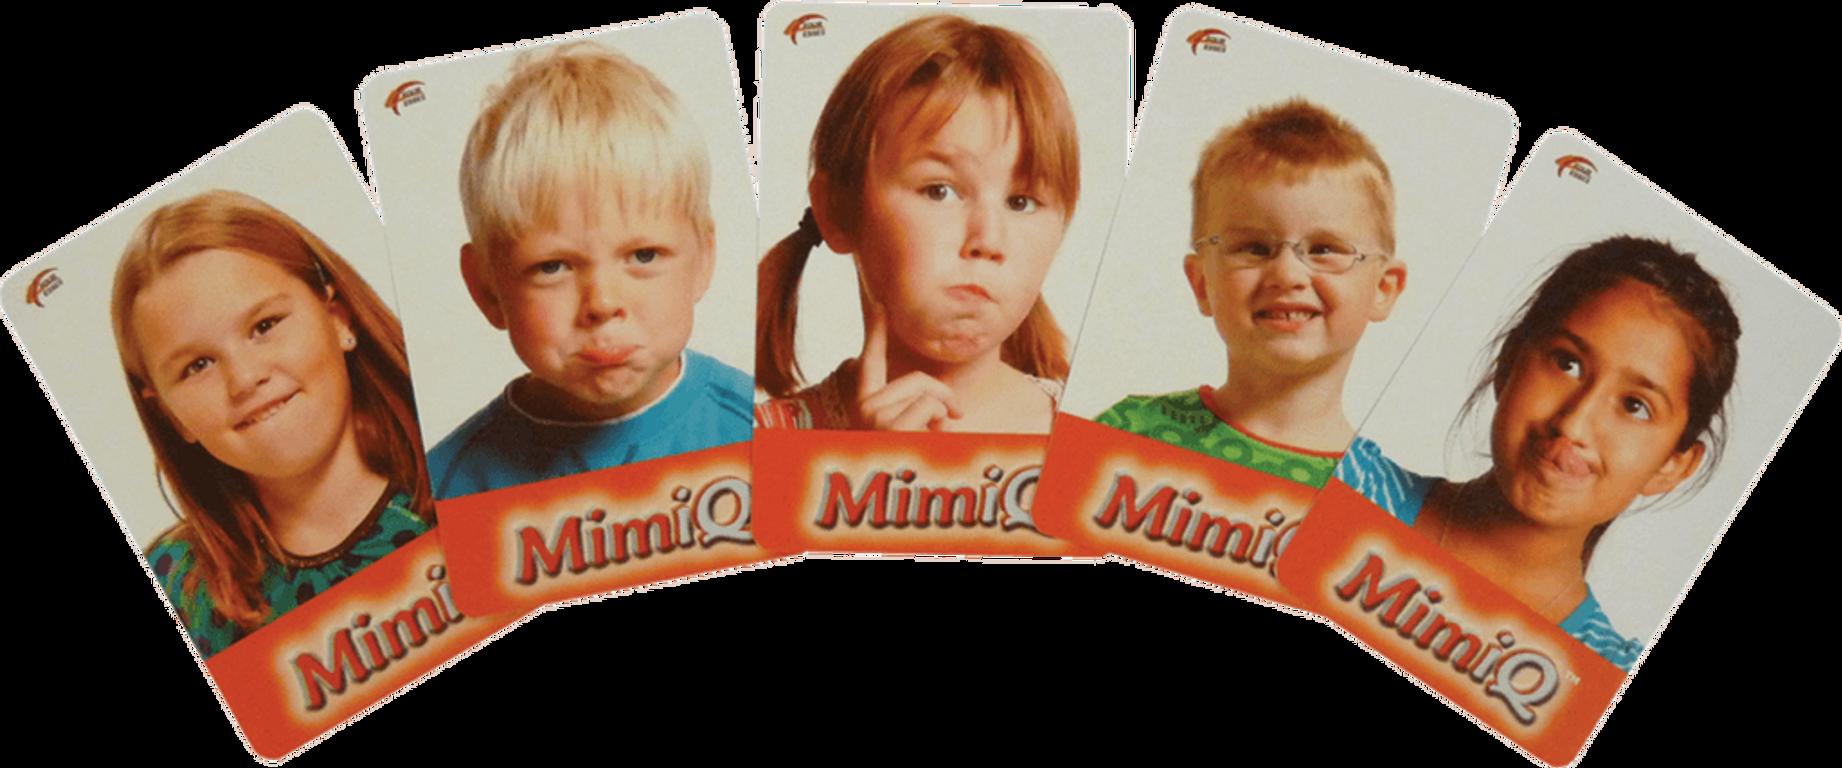 Mimiq cards